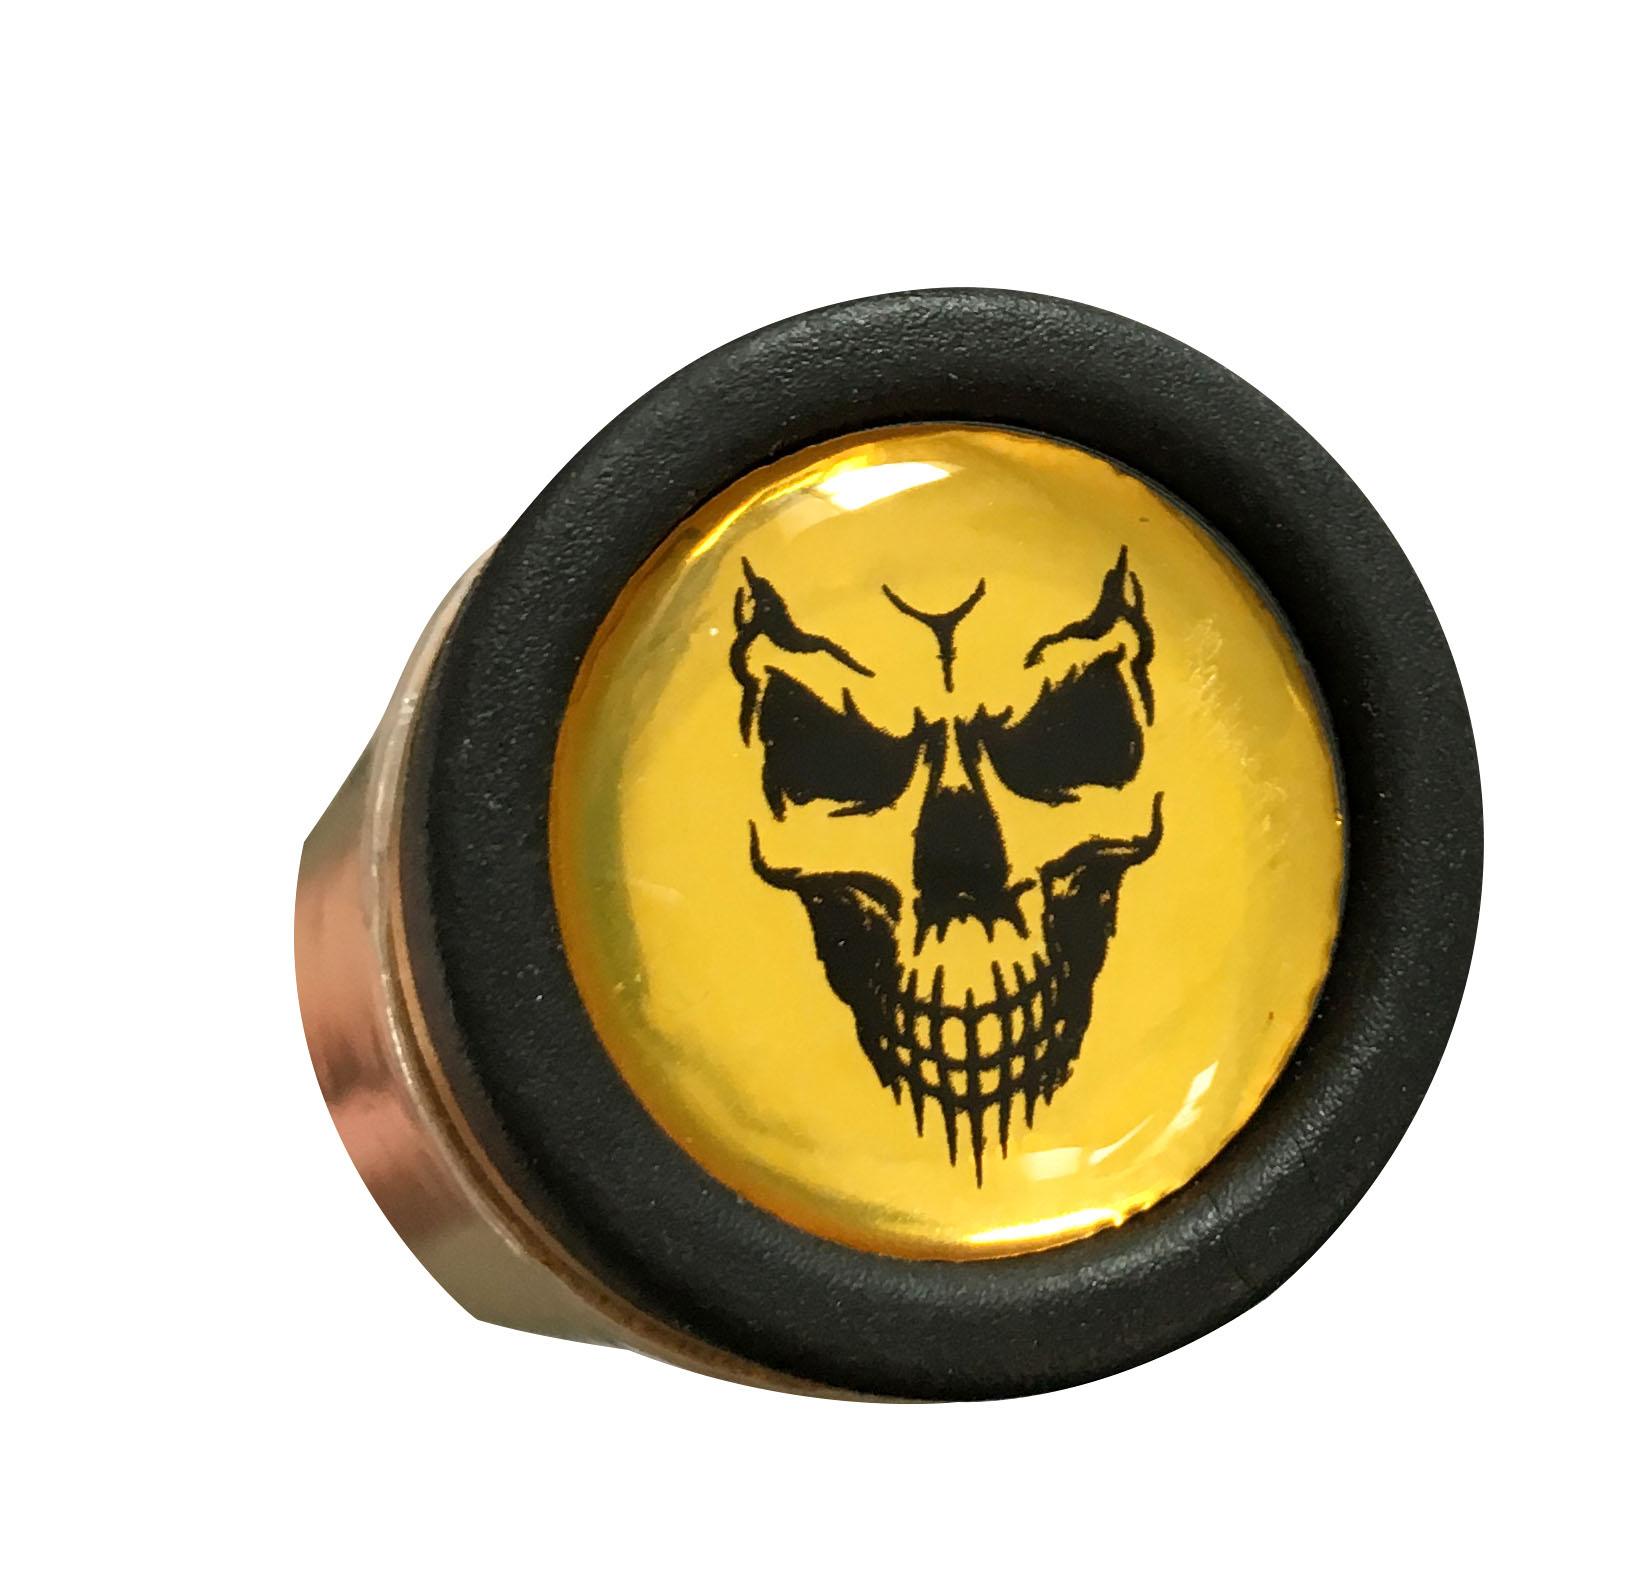 Balzer Diabolo X Drop Shot 2,30m 2,60m 3-24g Droshot Spin Rod Dropshotrute NEW